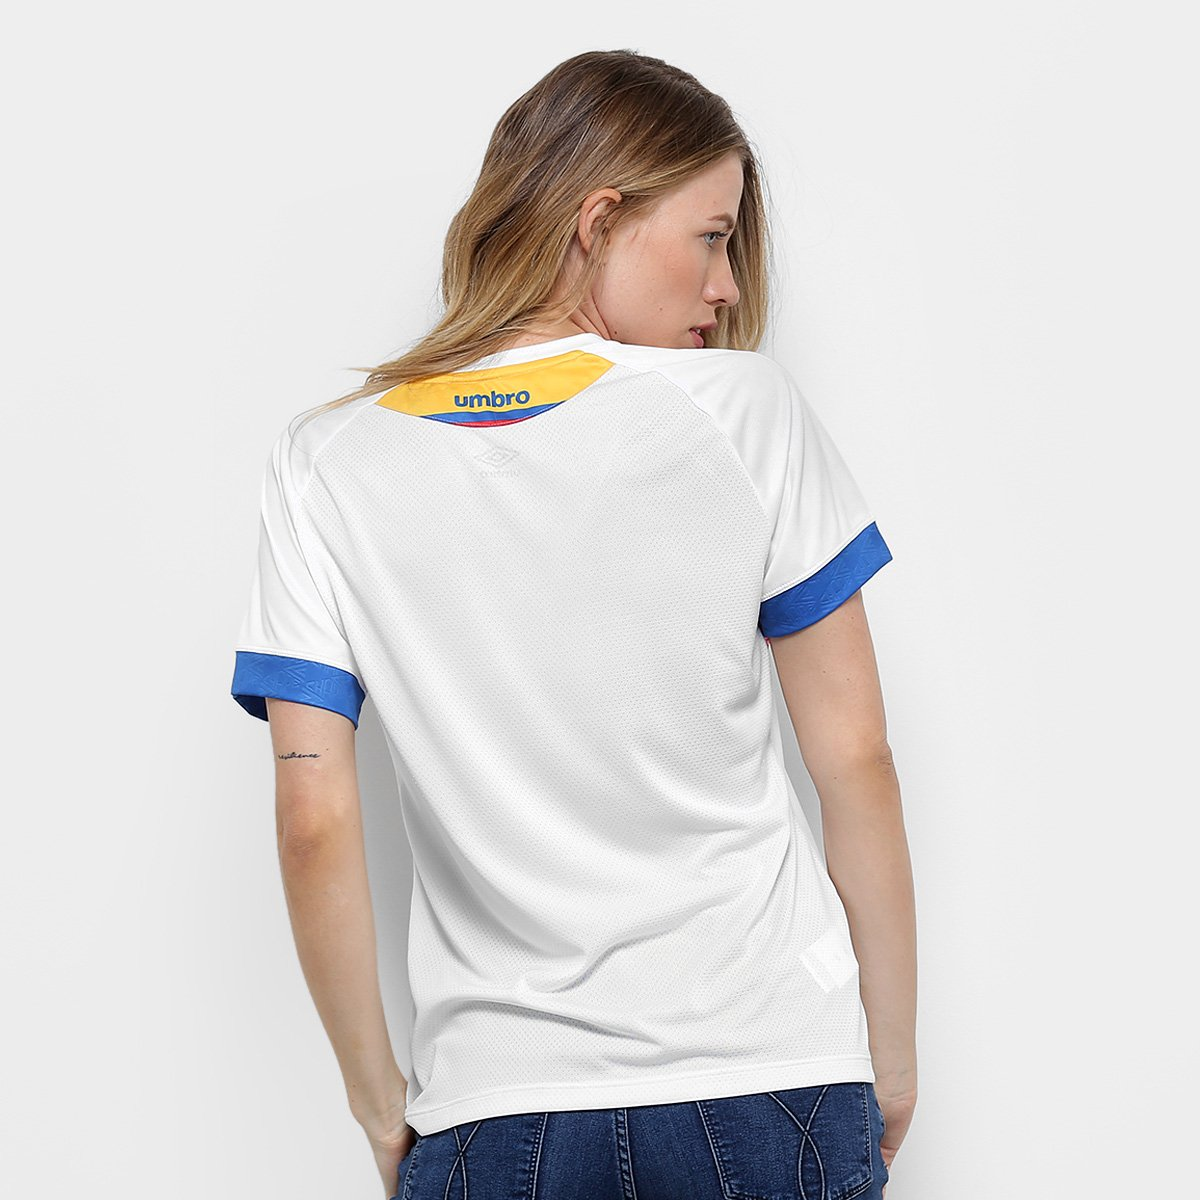 Azul e La Chapecoense s Pasion Feminina Torcedor n° Branco Camisa 2018 II Umbro P7qwXpXg